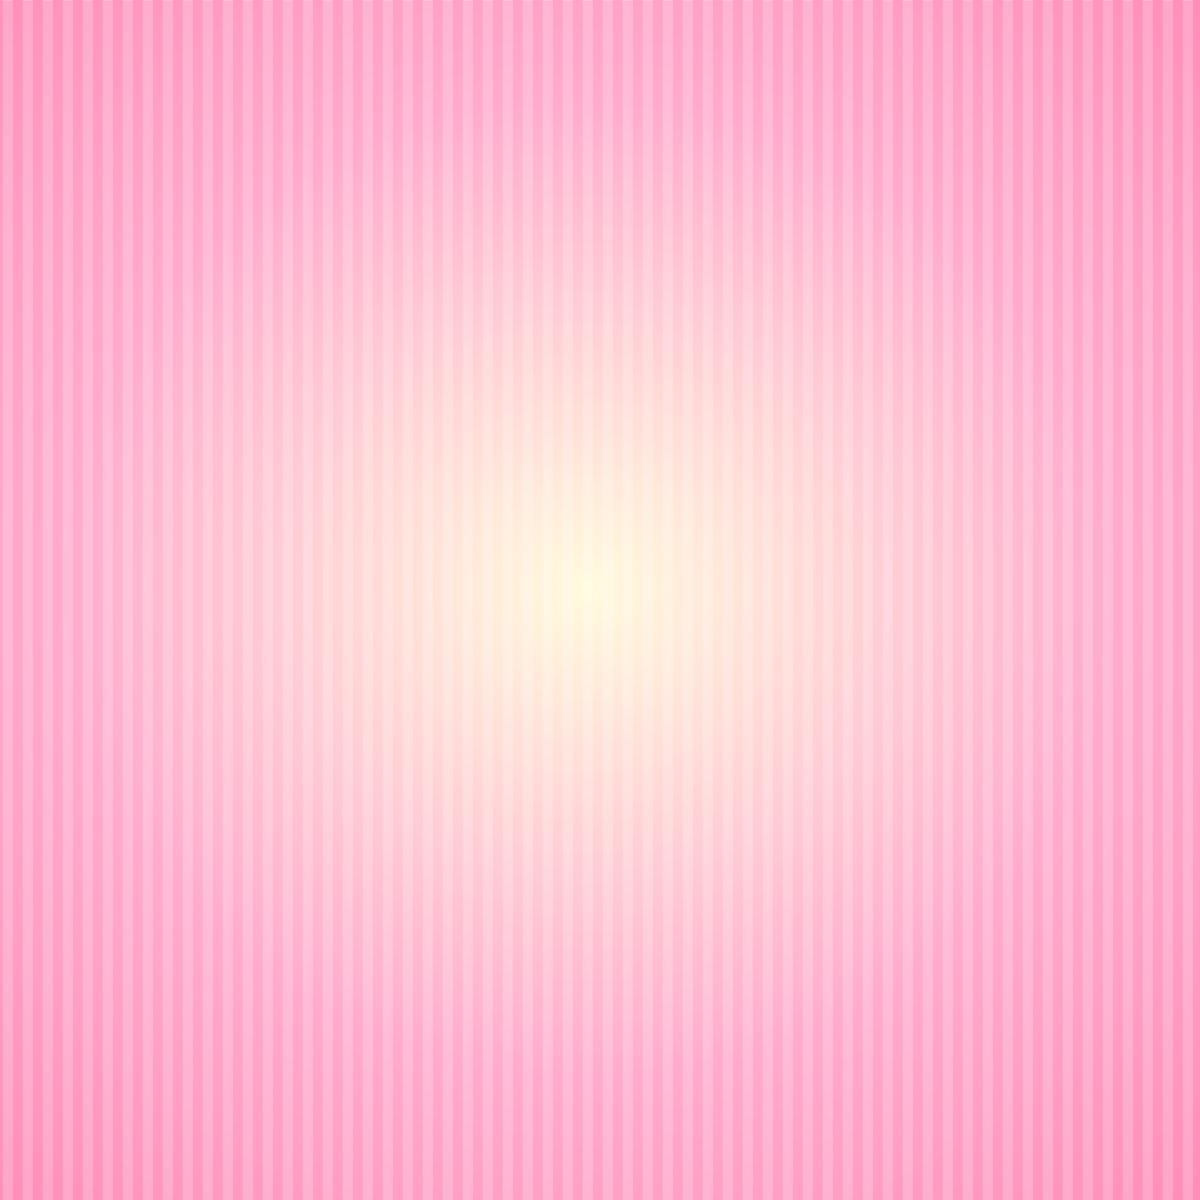 pink paper Pink paper studio, parkland (florida) (parkland, florida) 2,464 likes 10 talking about this porque los detalles hacen la diferencia creamos para ti.